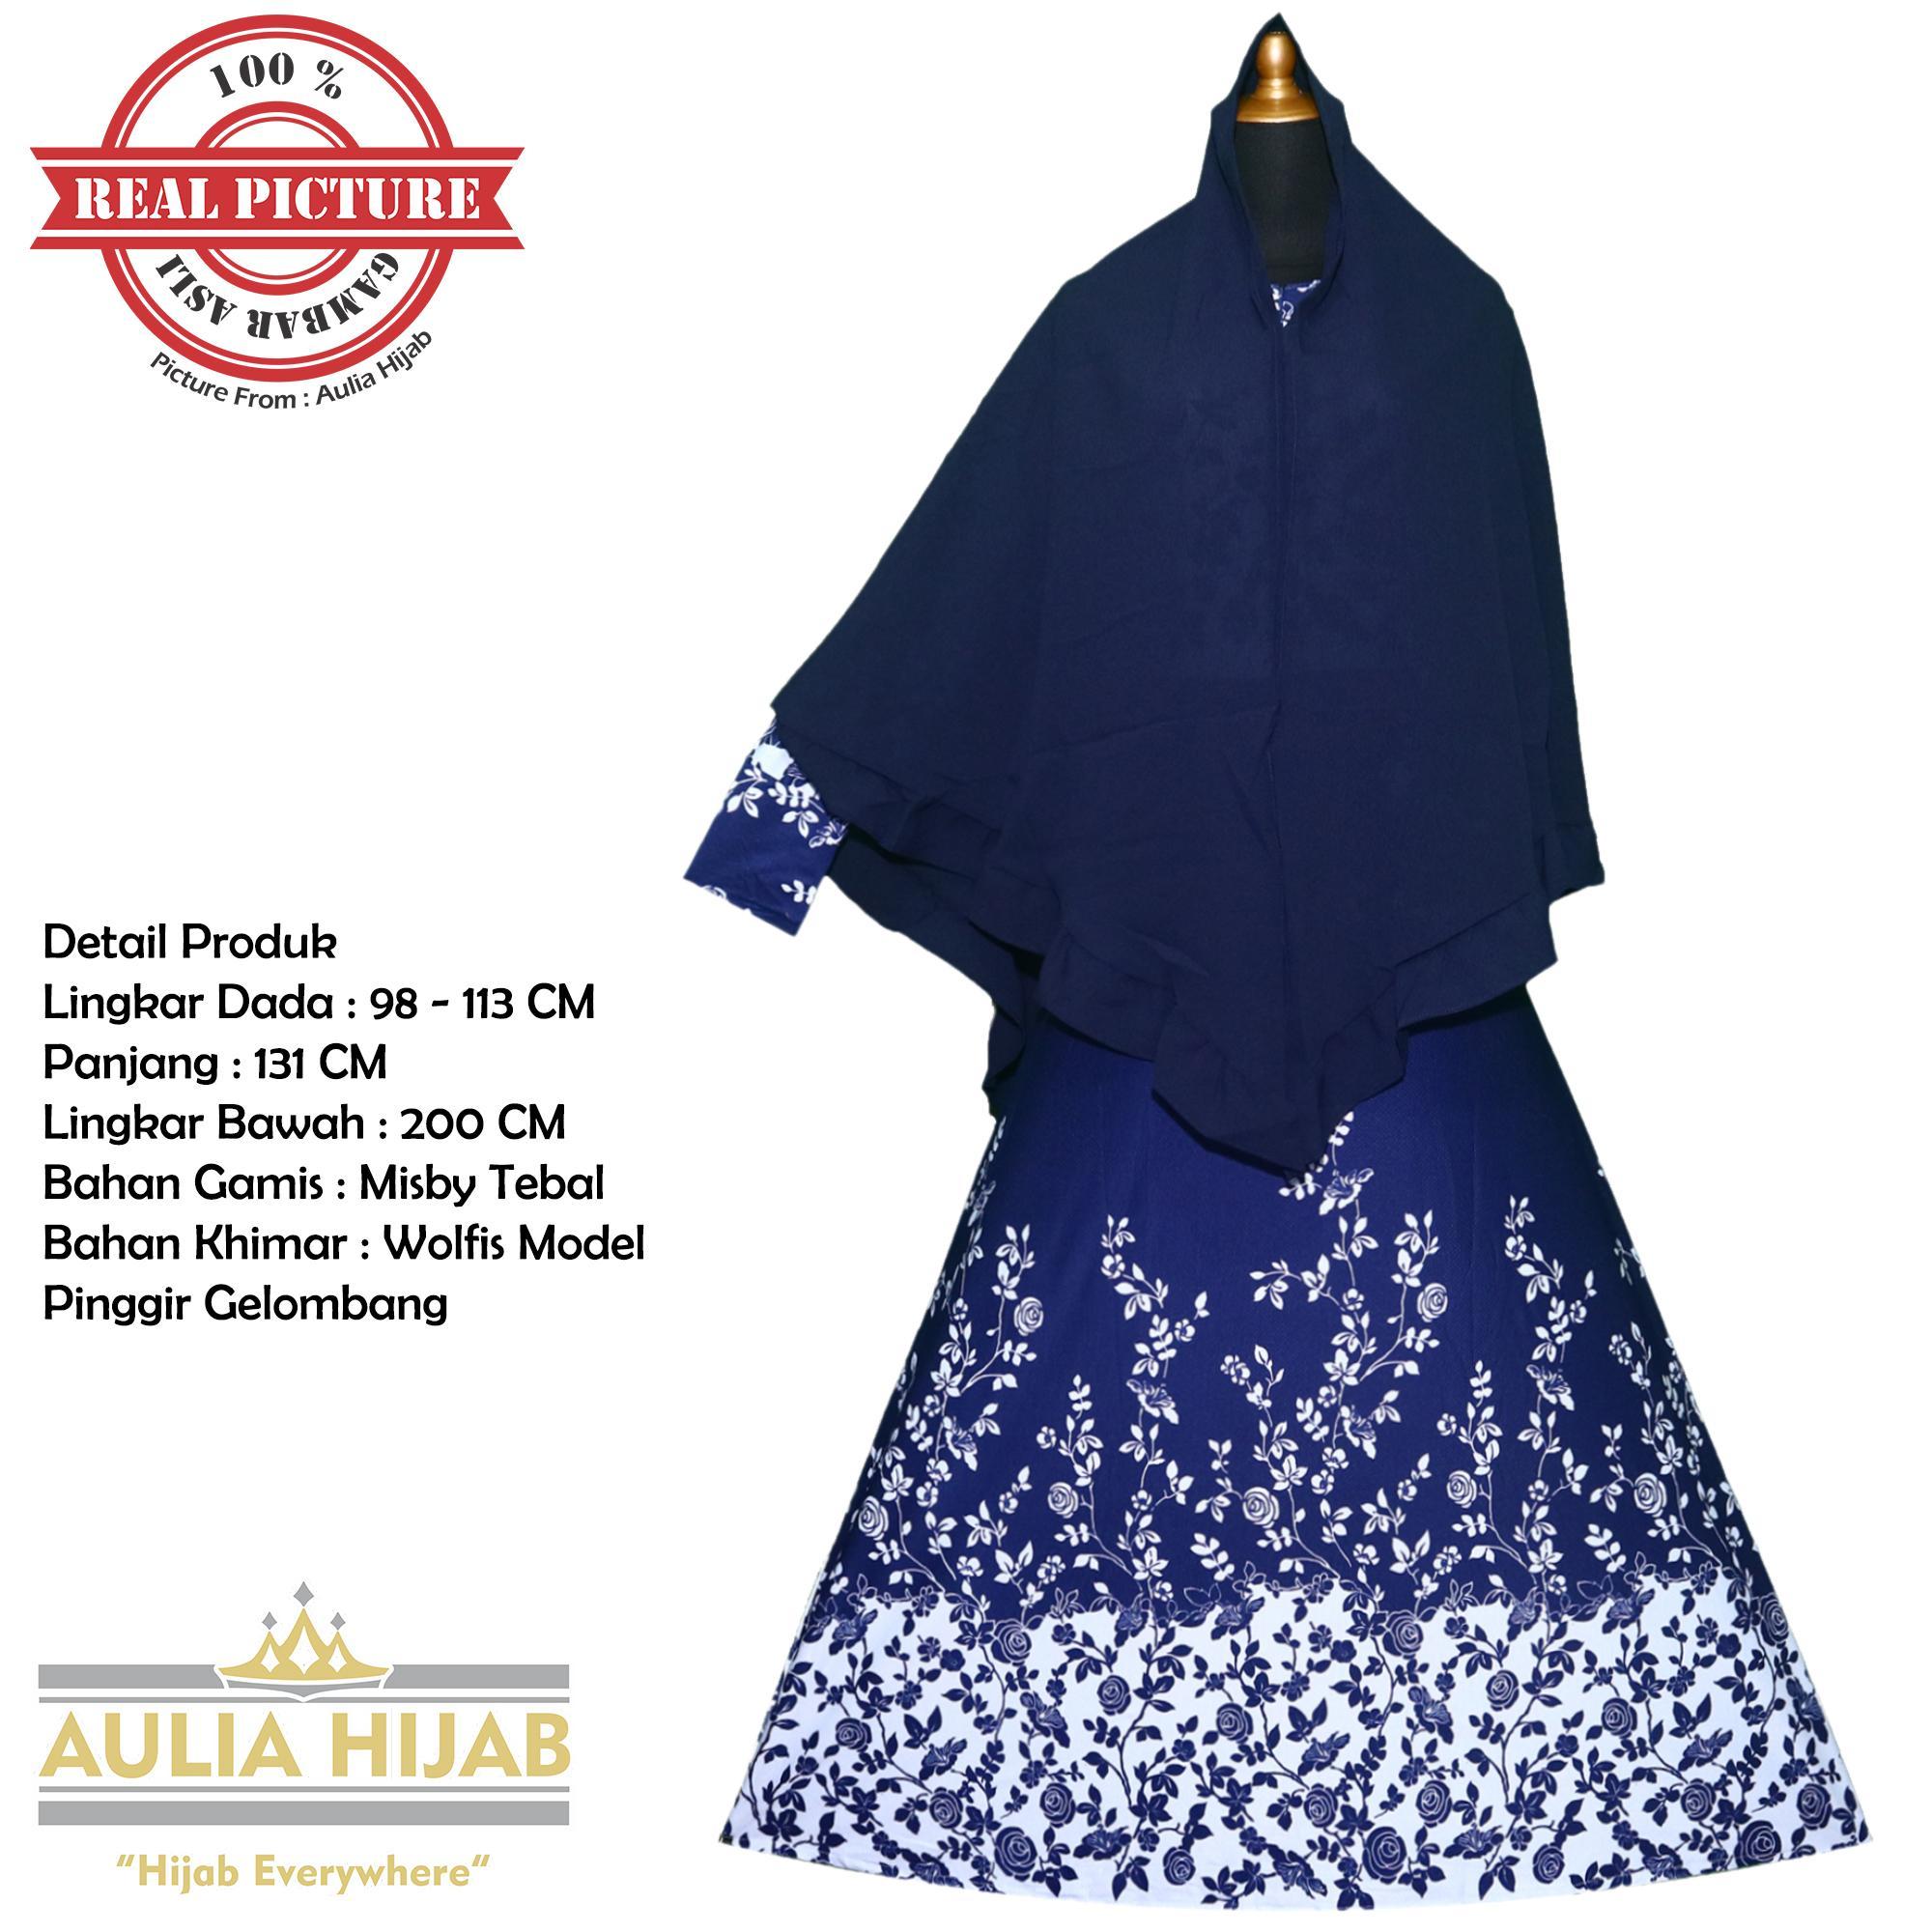 Aulia Hijab New Najwa Syar i Gamis Syar i Gamis Misby